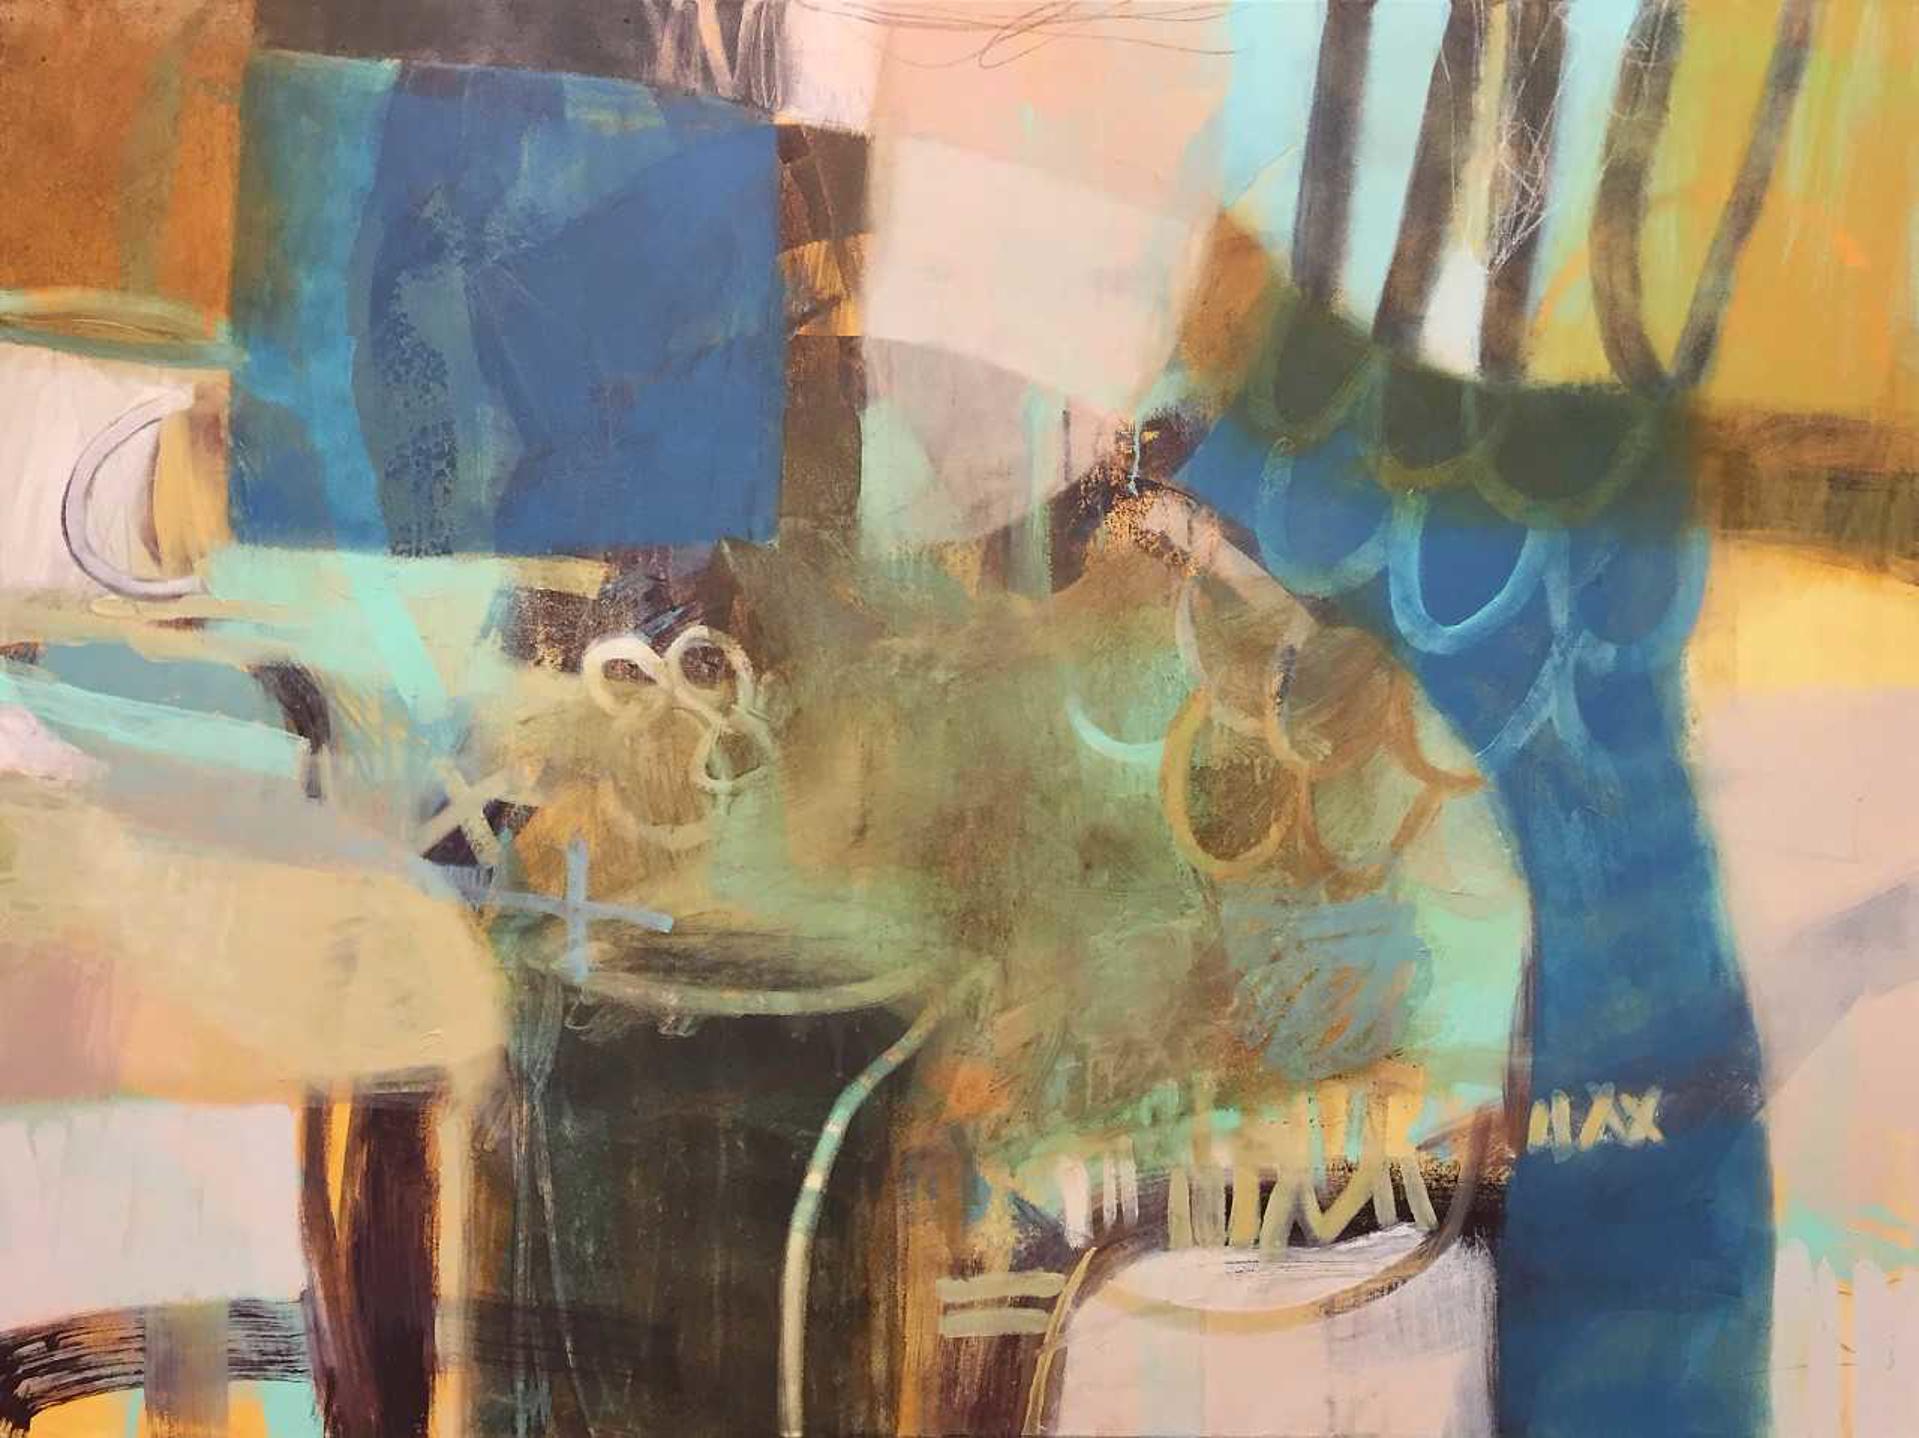 Untitled 170923 by Karen Roehl